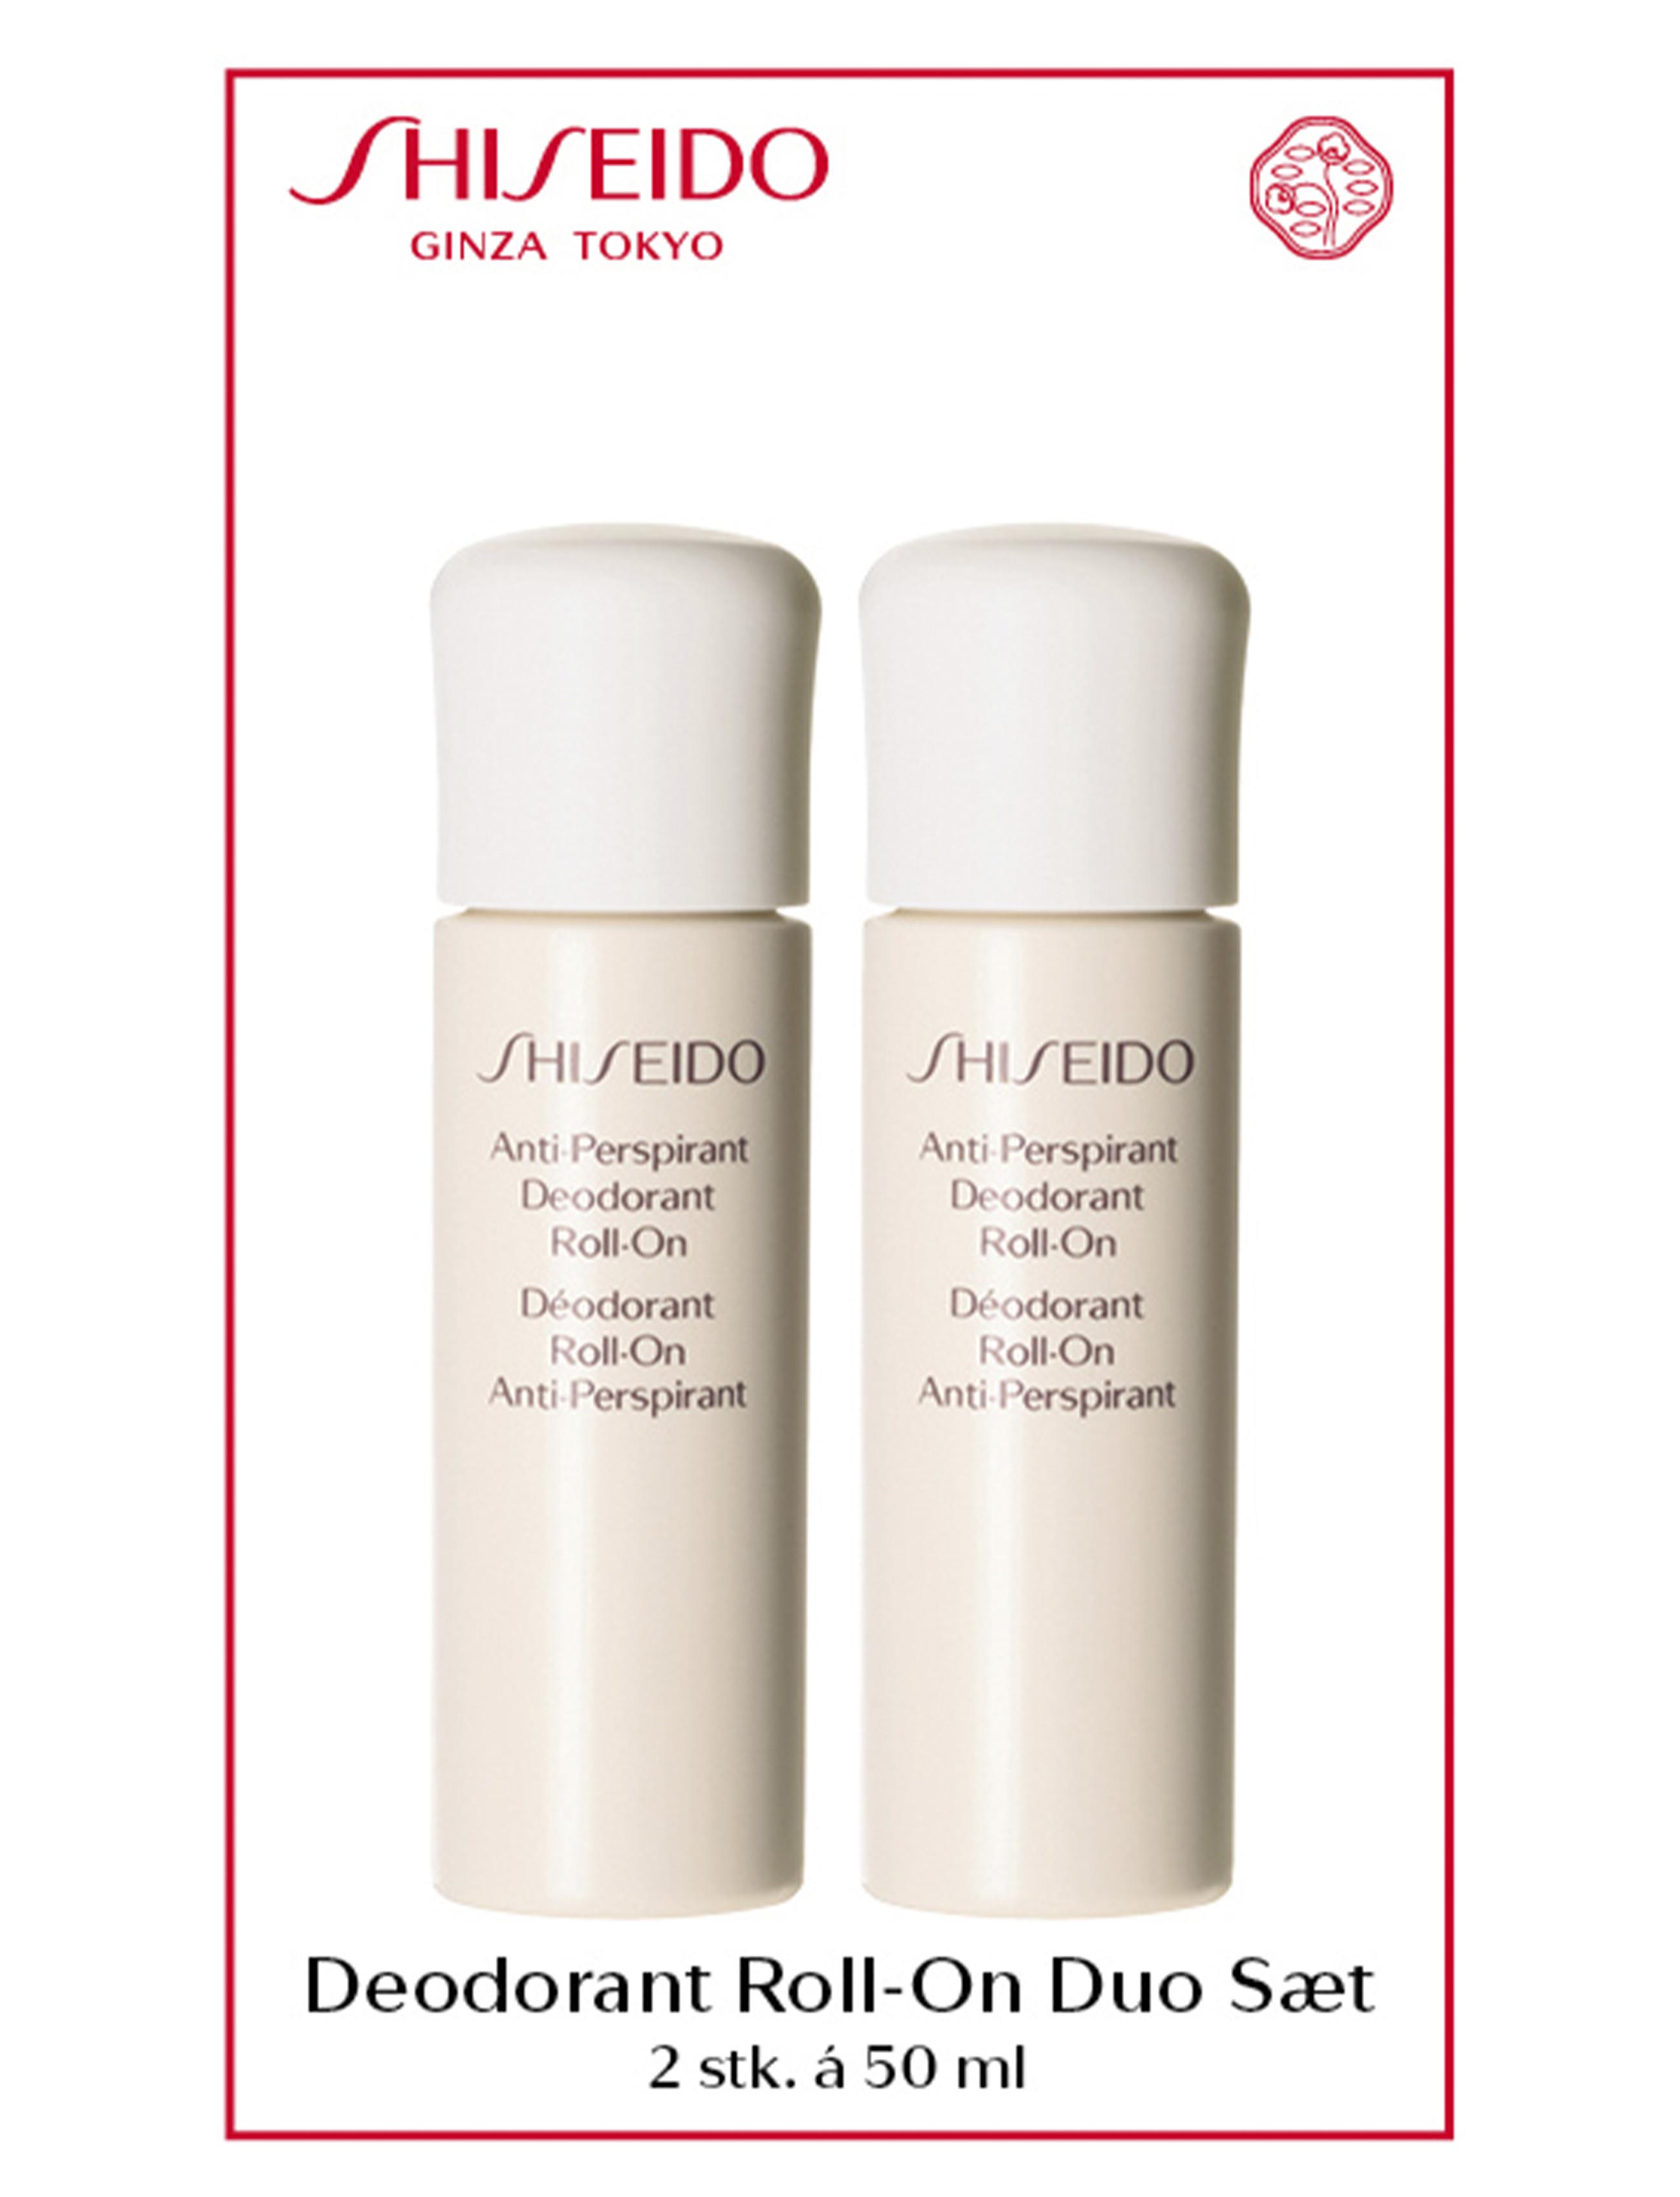 Shiseido Deodorant Deo Duo Roll On Set